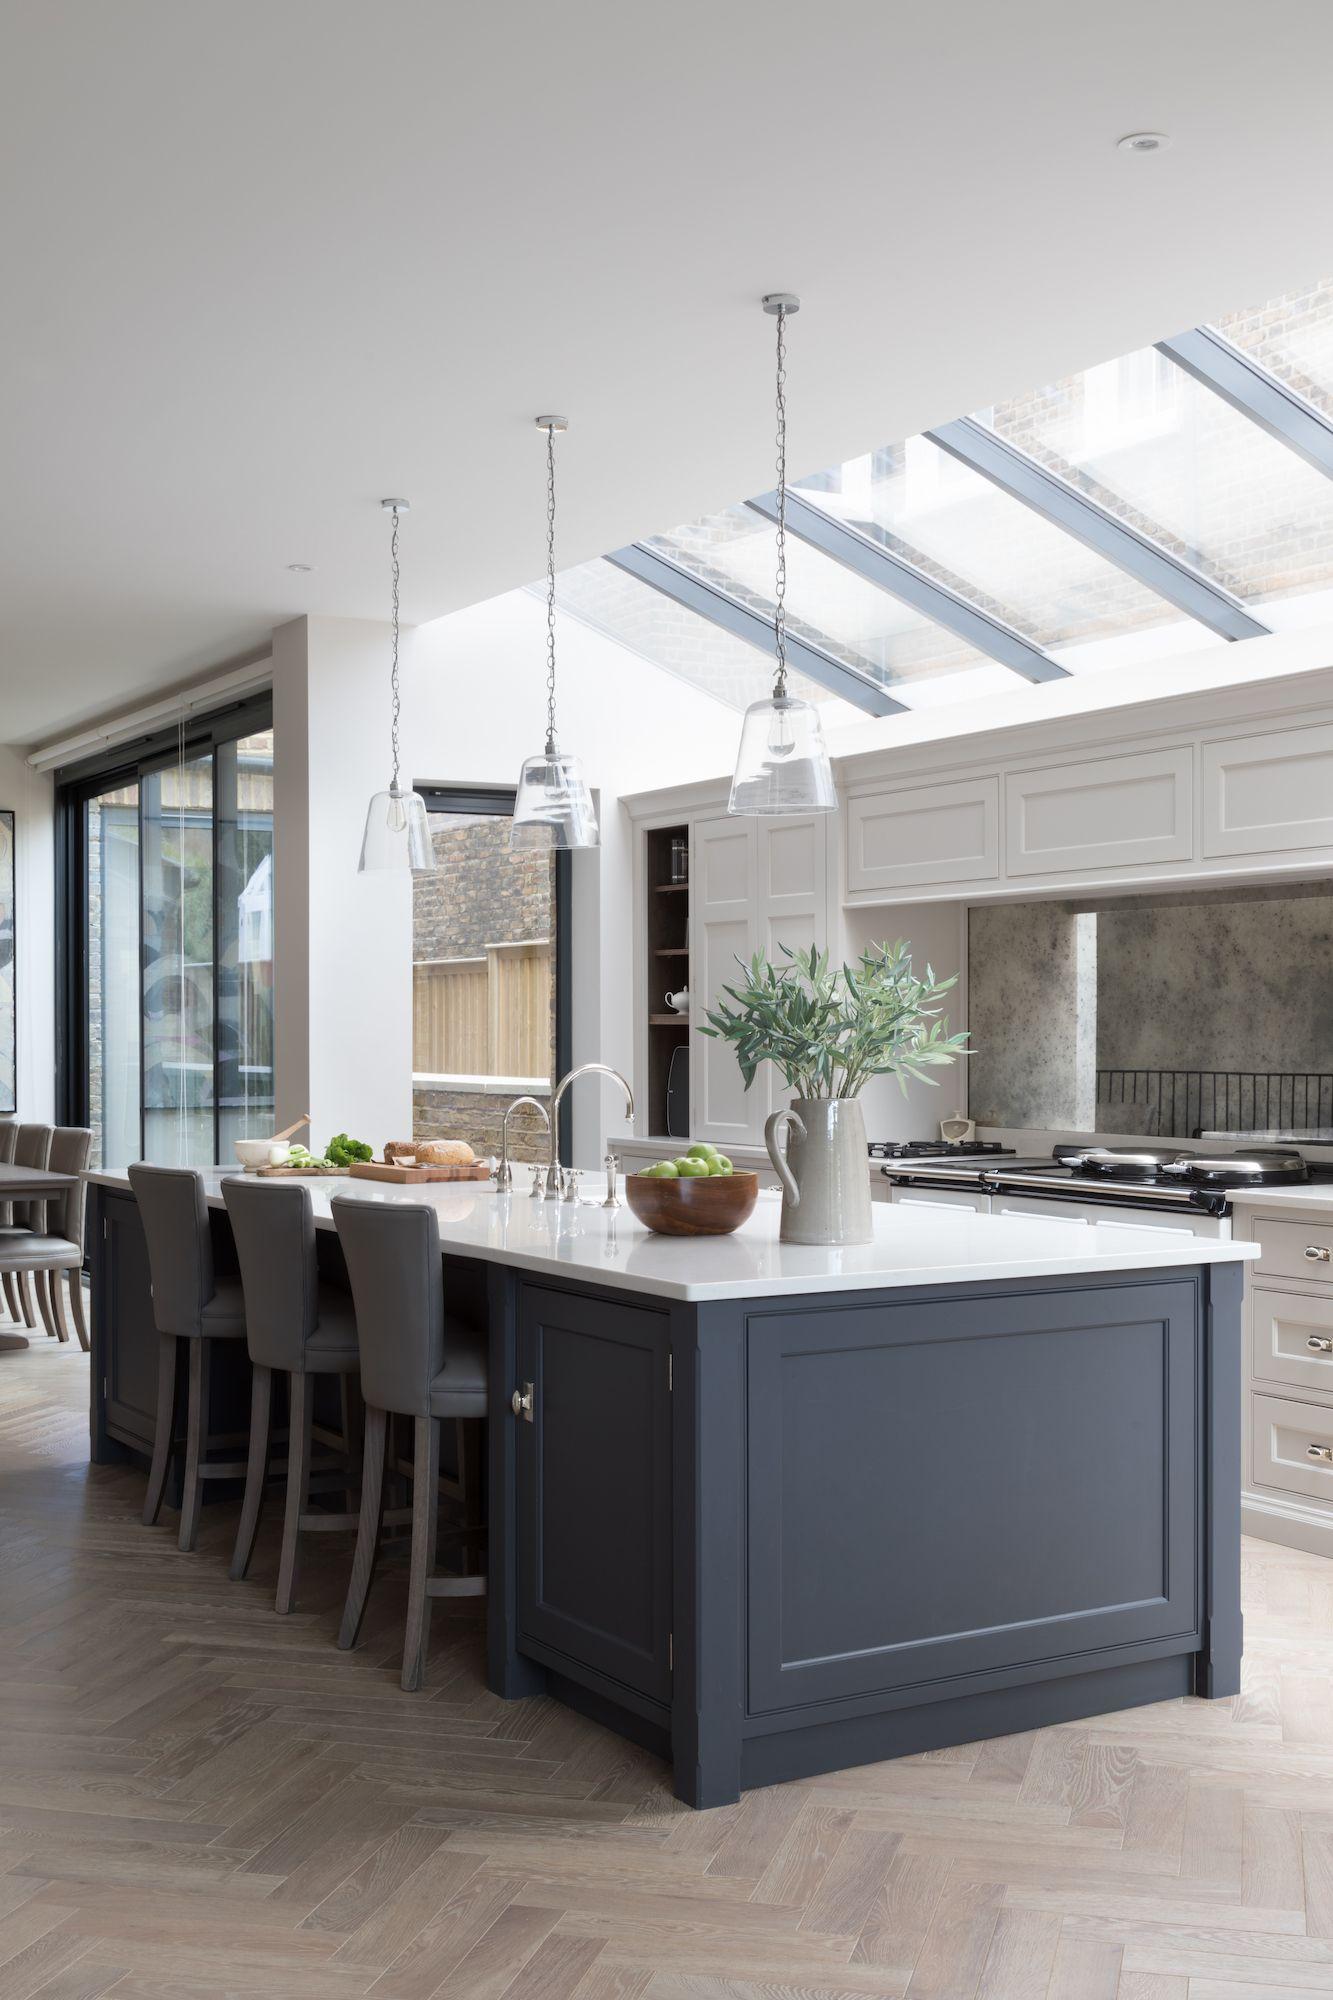 North London Project Humphrey Munson Kitchens in 2020